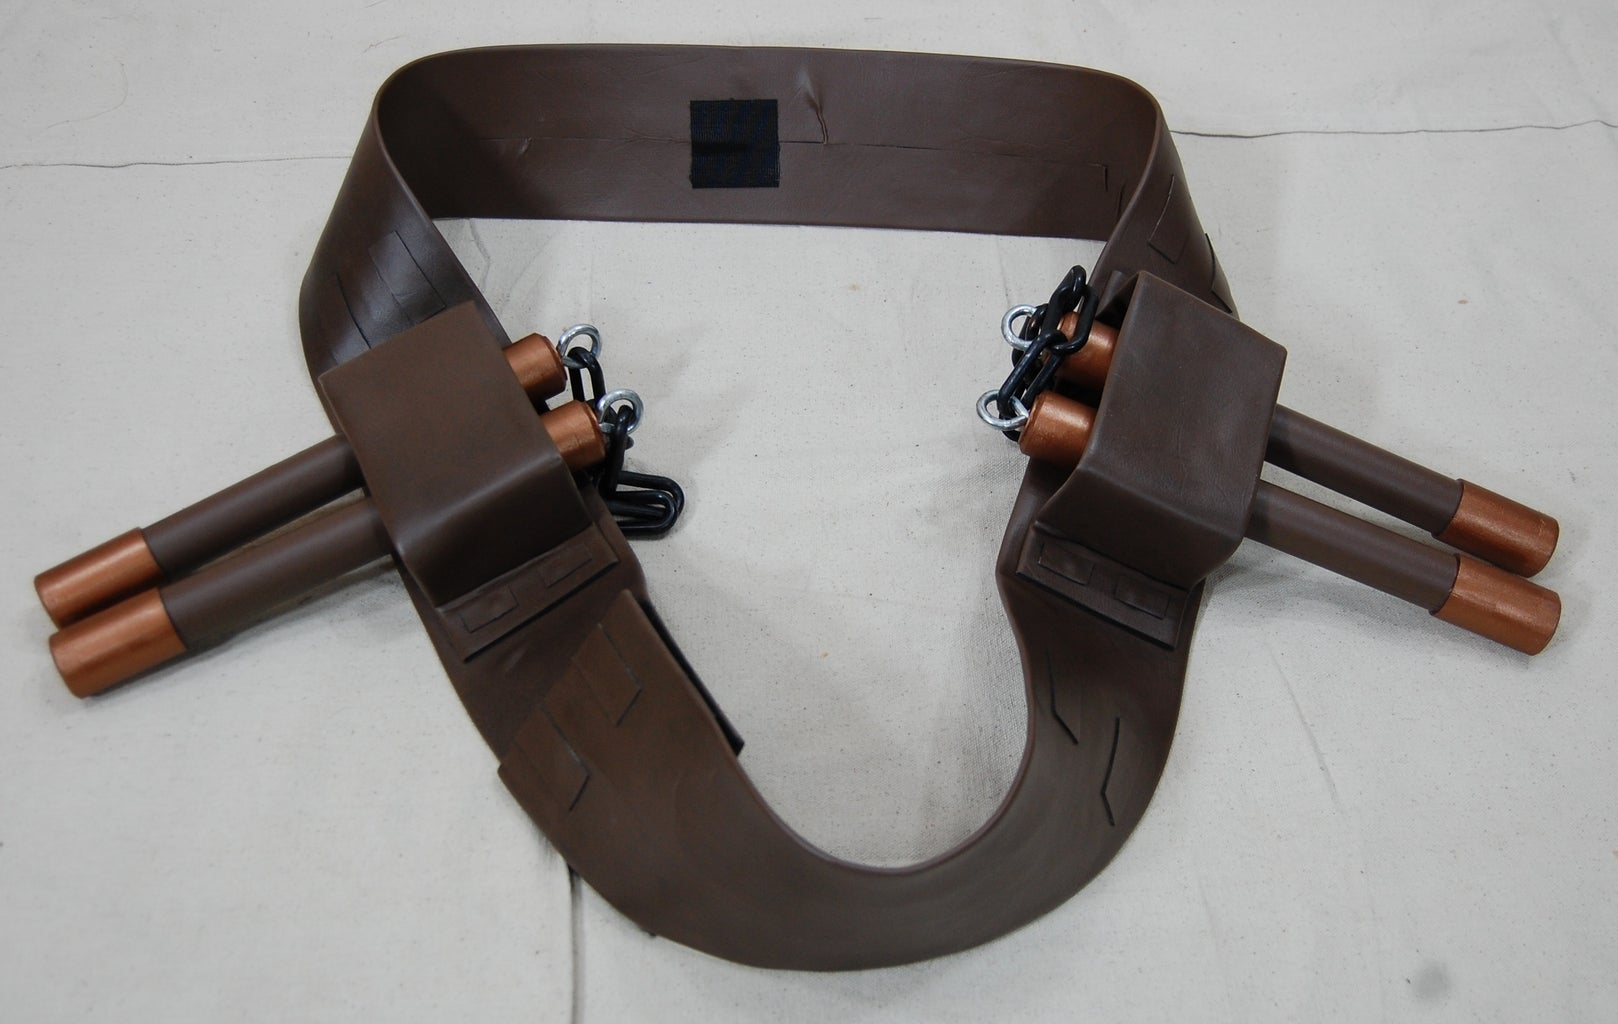 The Belt With Nunchaku Holders